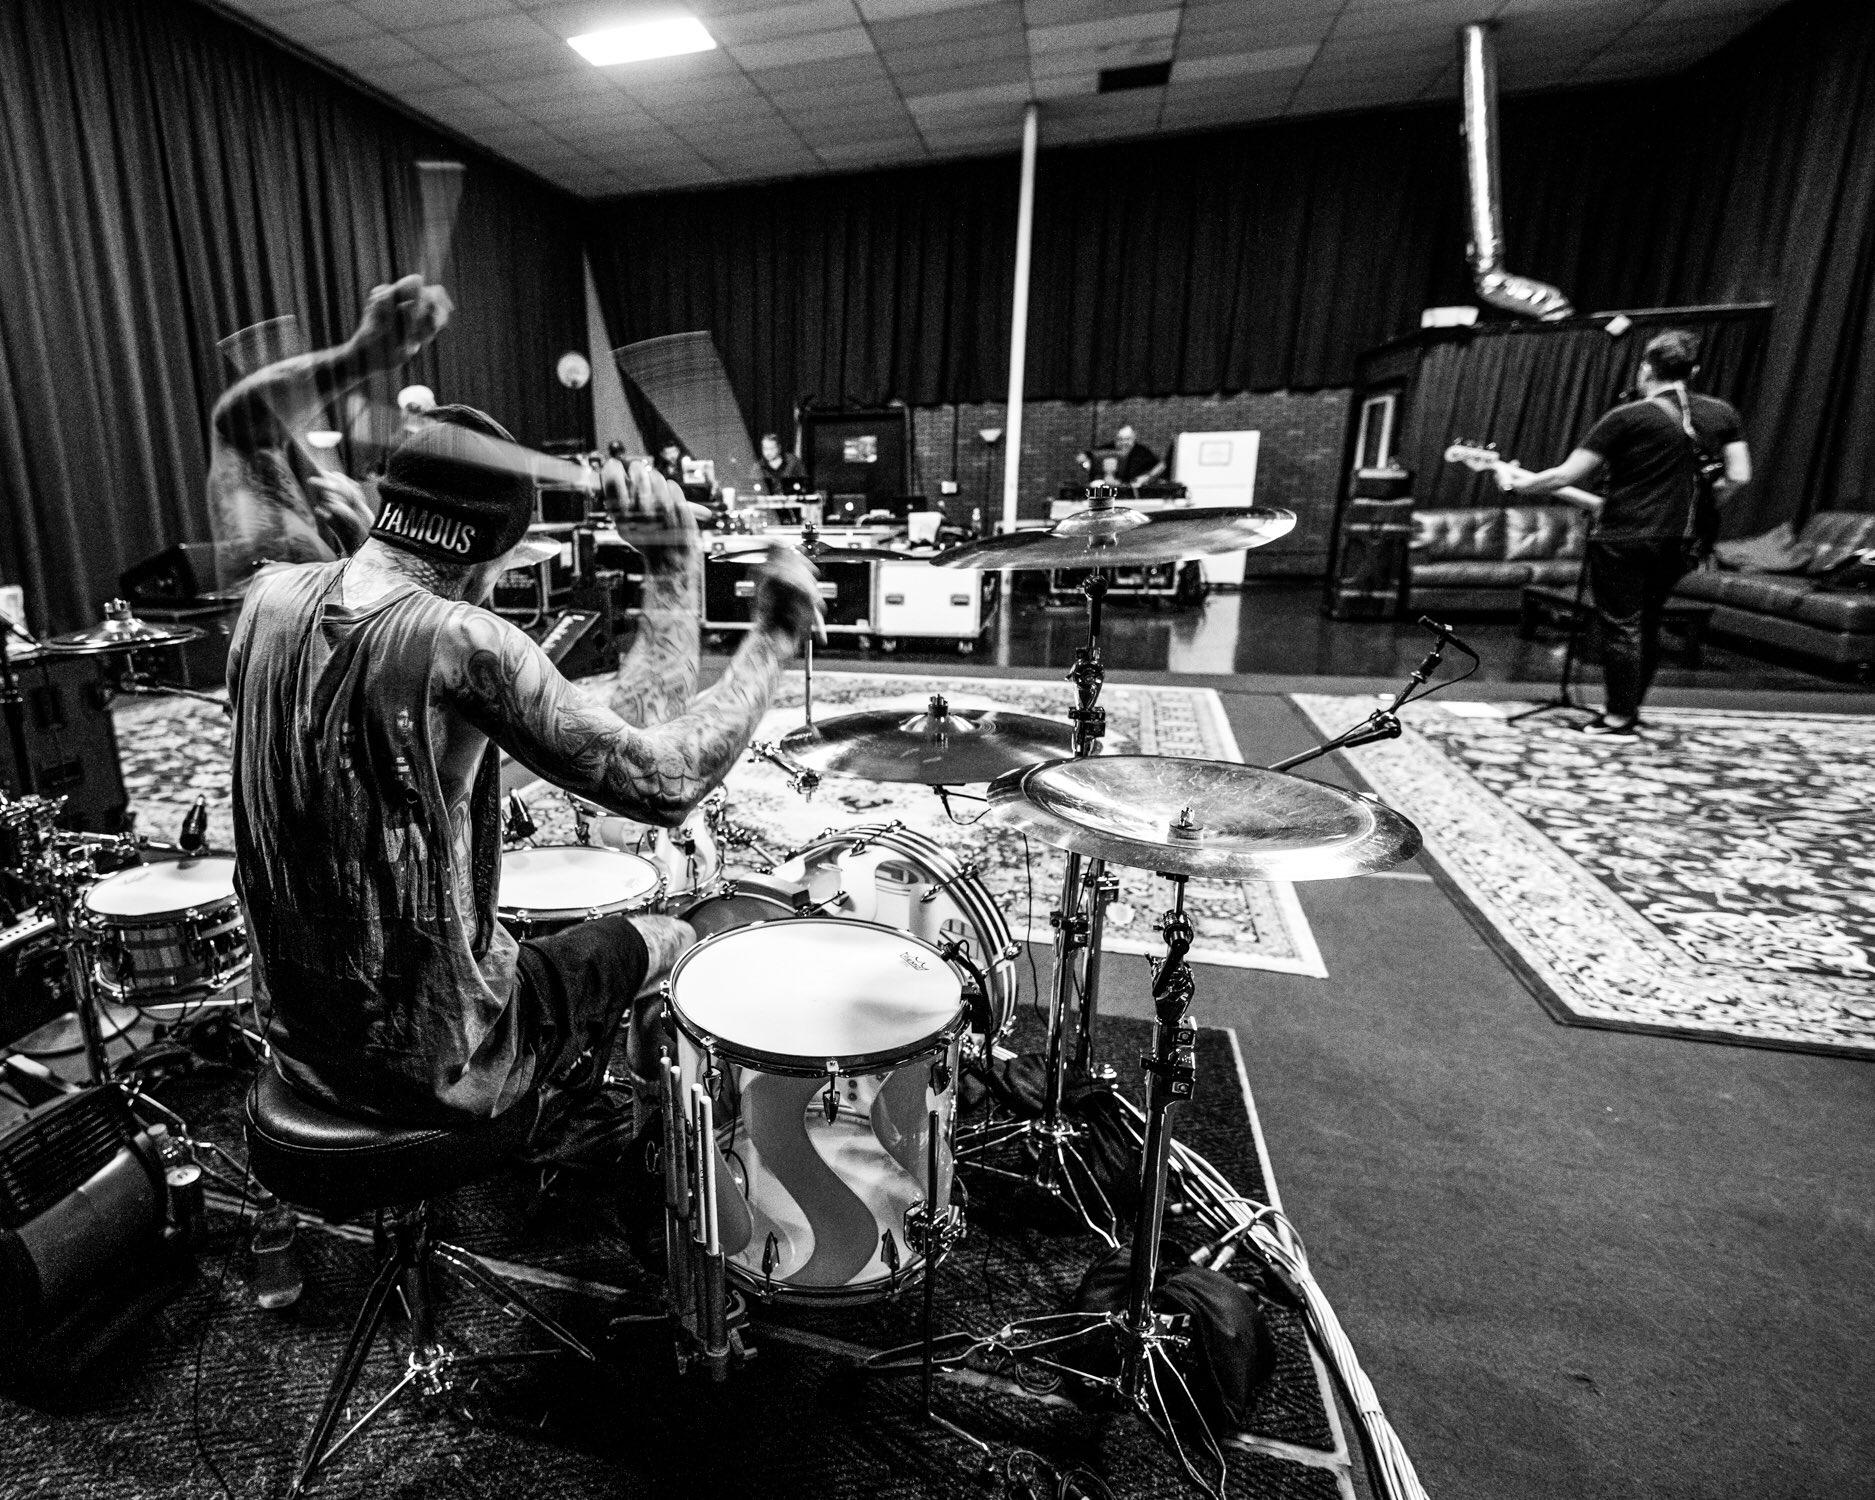 Rehearsals @blink182 @ChesterBe tribute ���� https://t.co/umcqwjC2bK